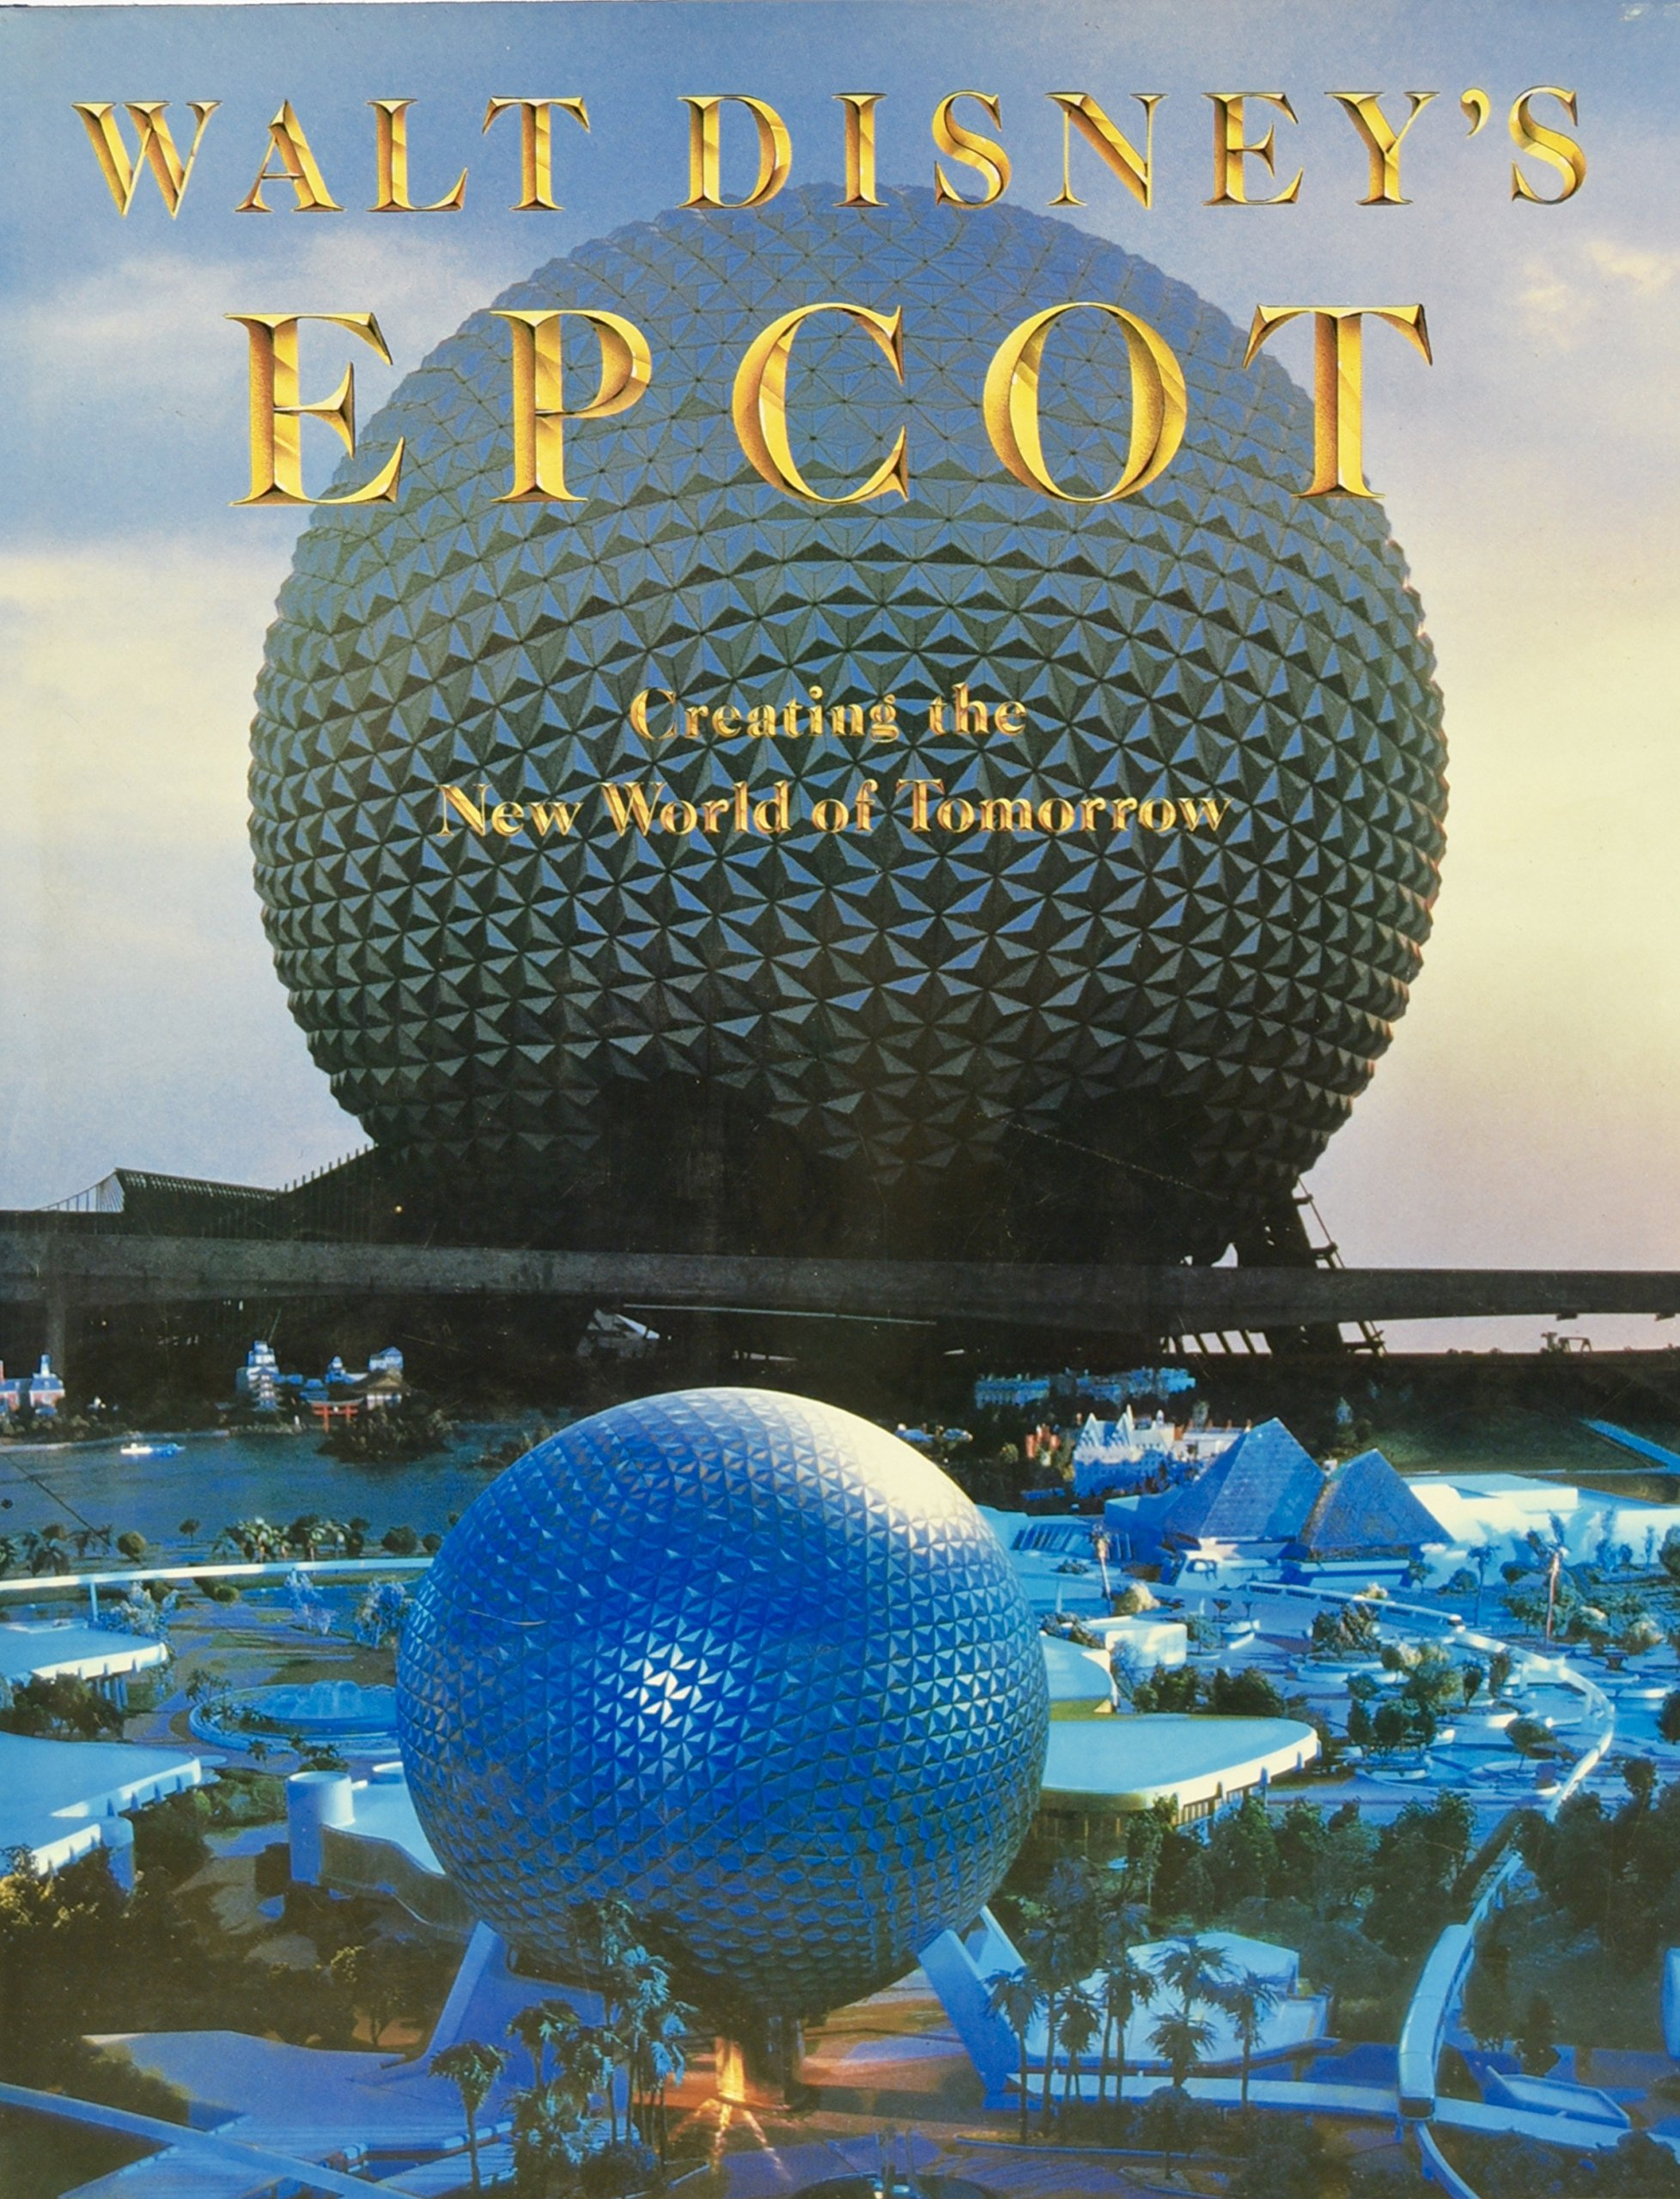 walt disney s epcot center creating the new world of tomorrow